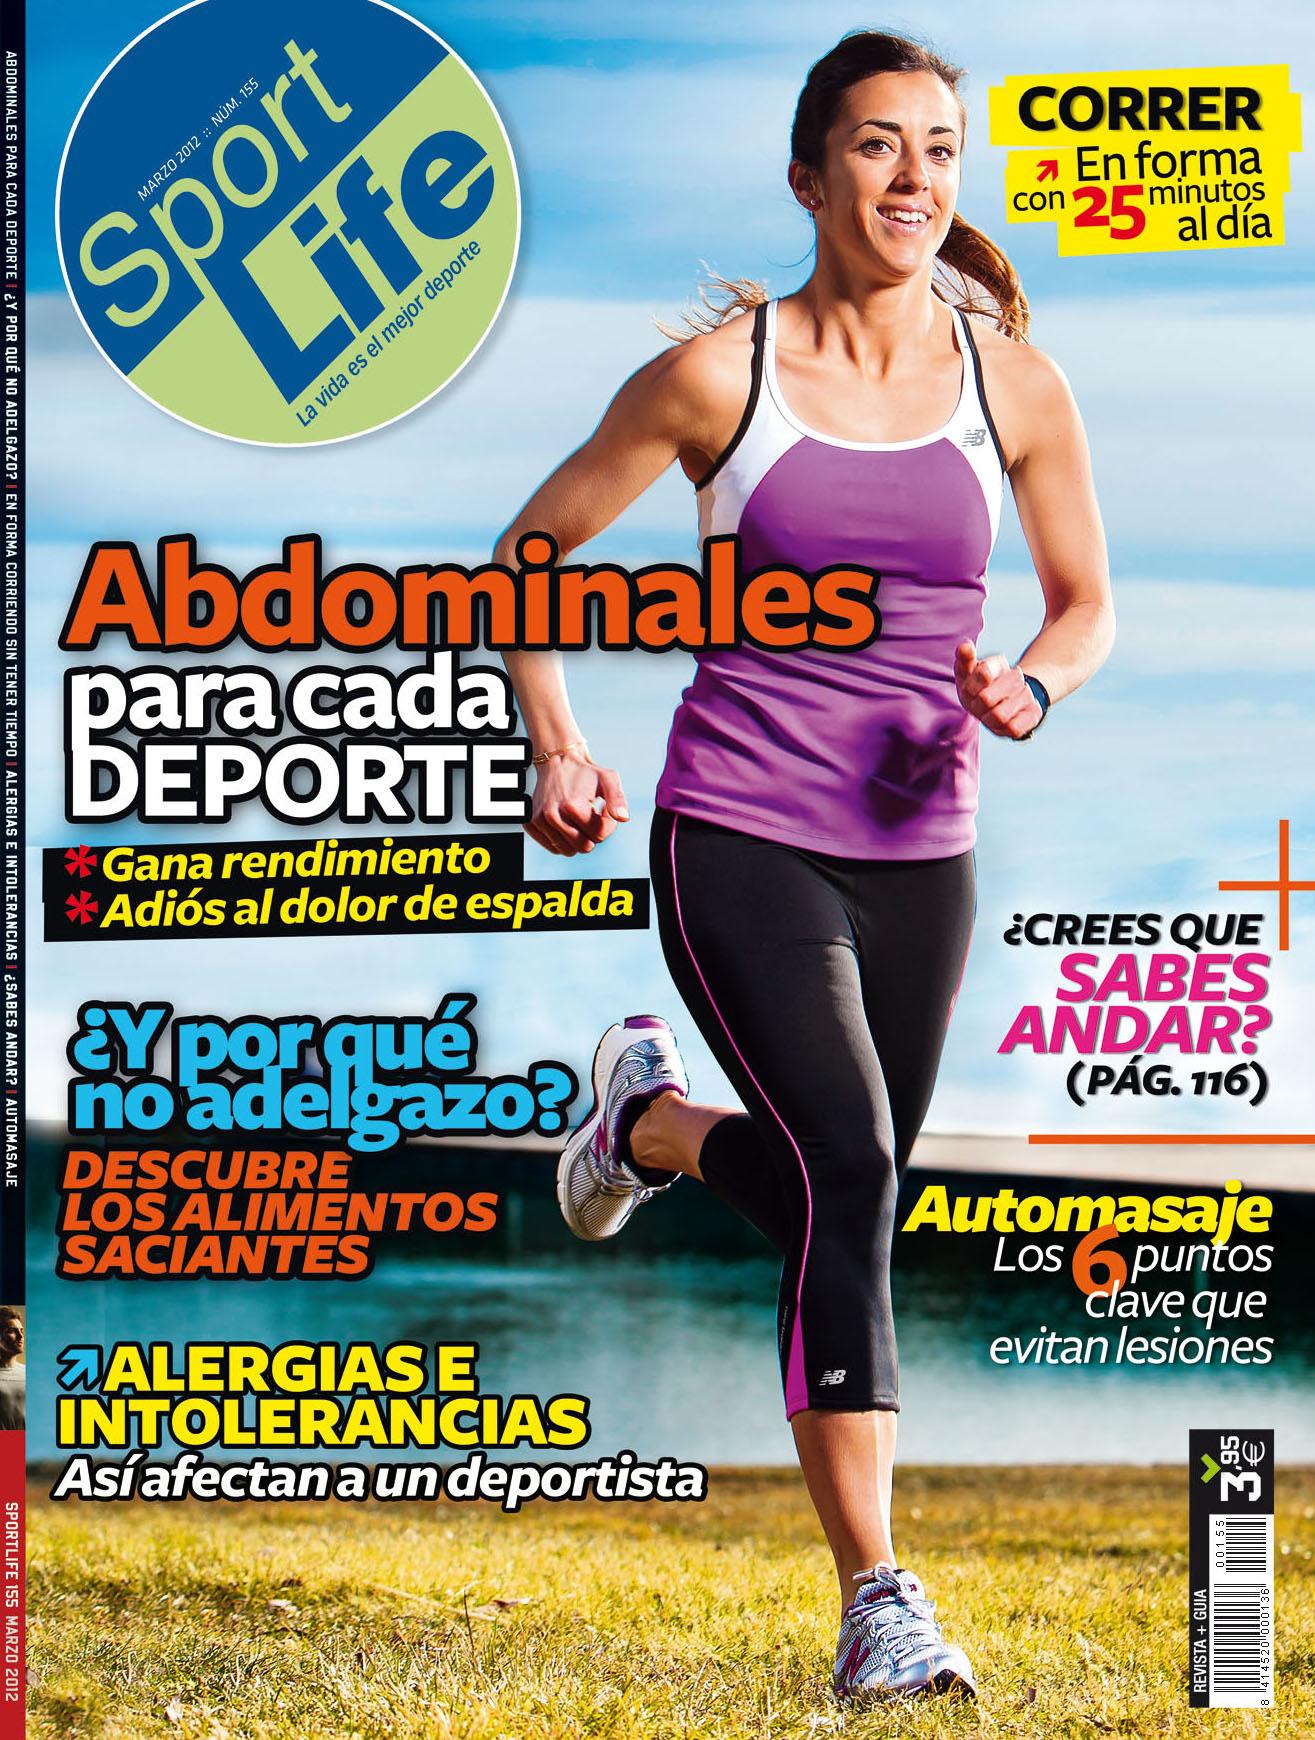 Sumario Sport Life 155 marzo 2012